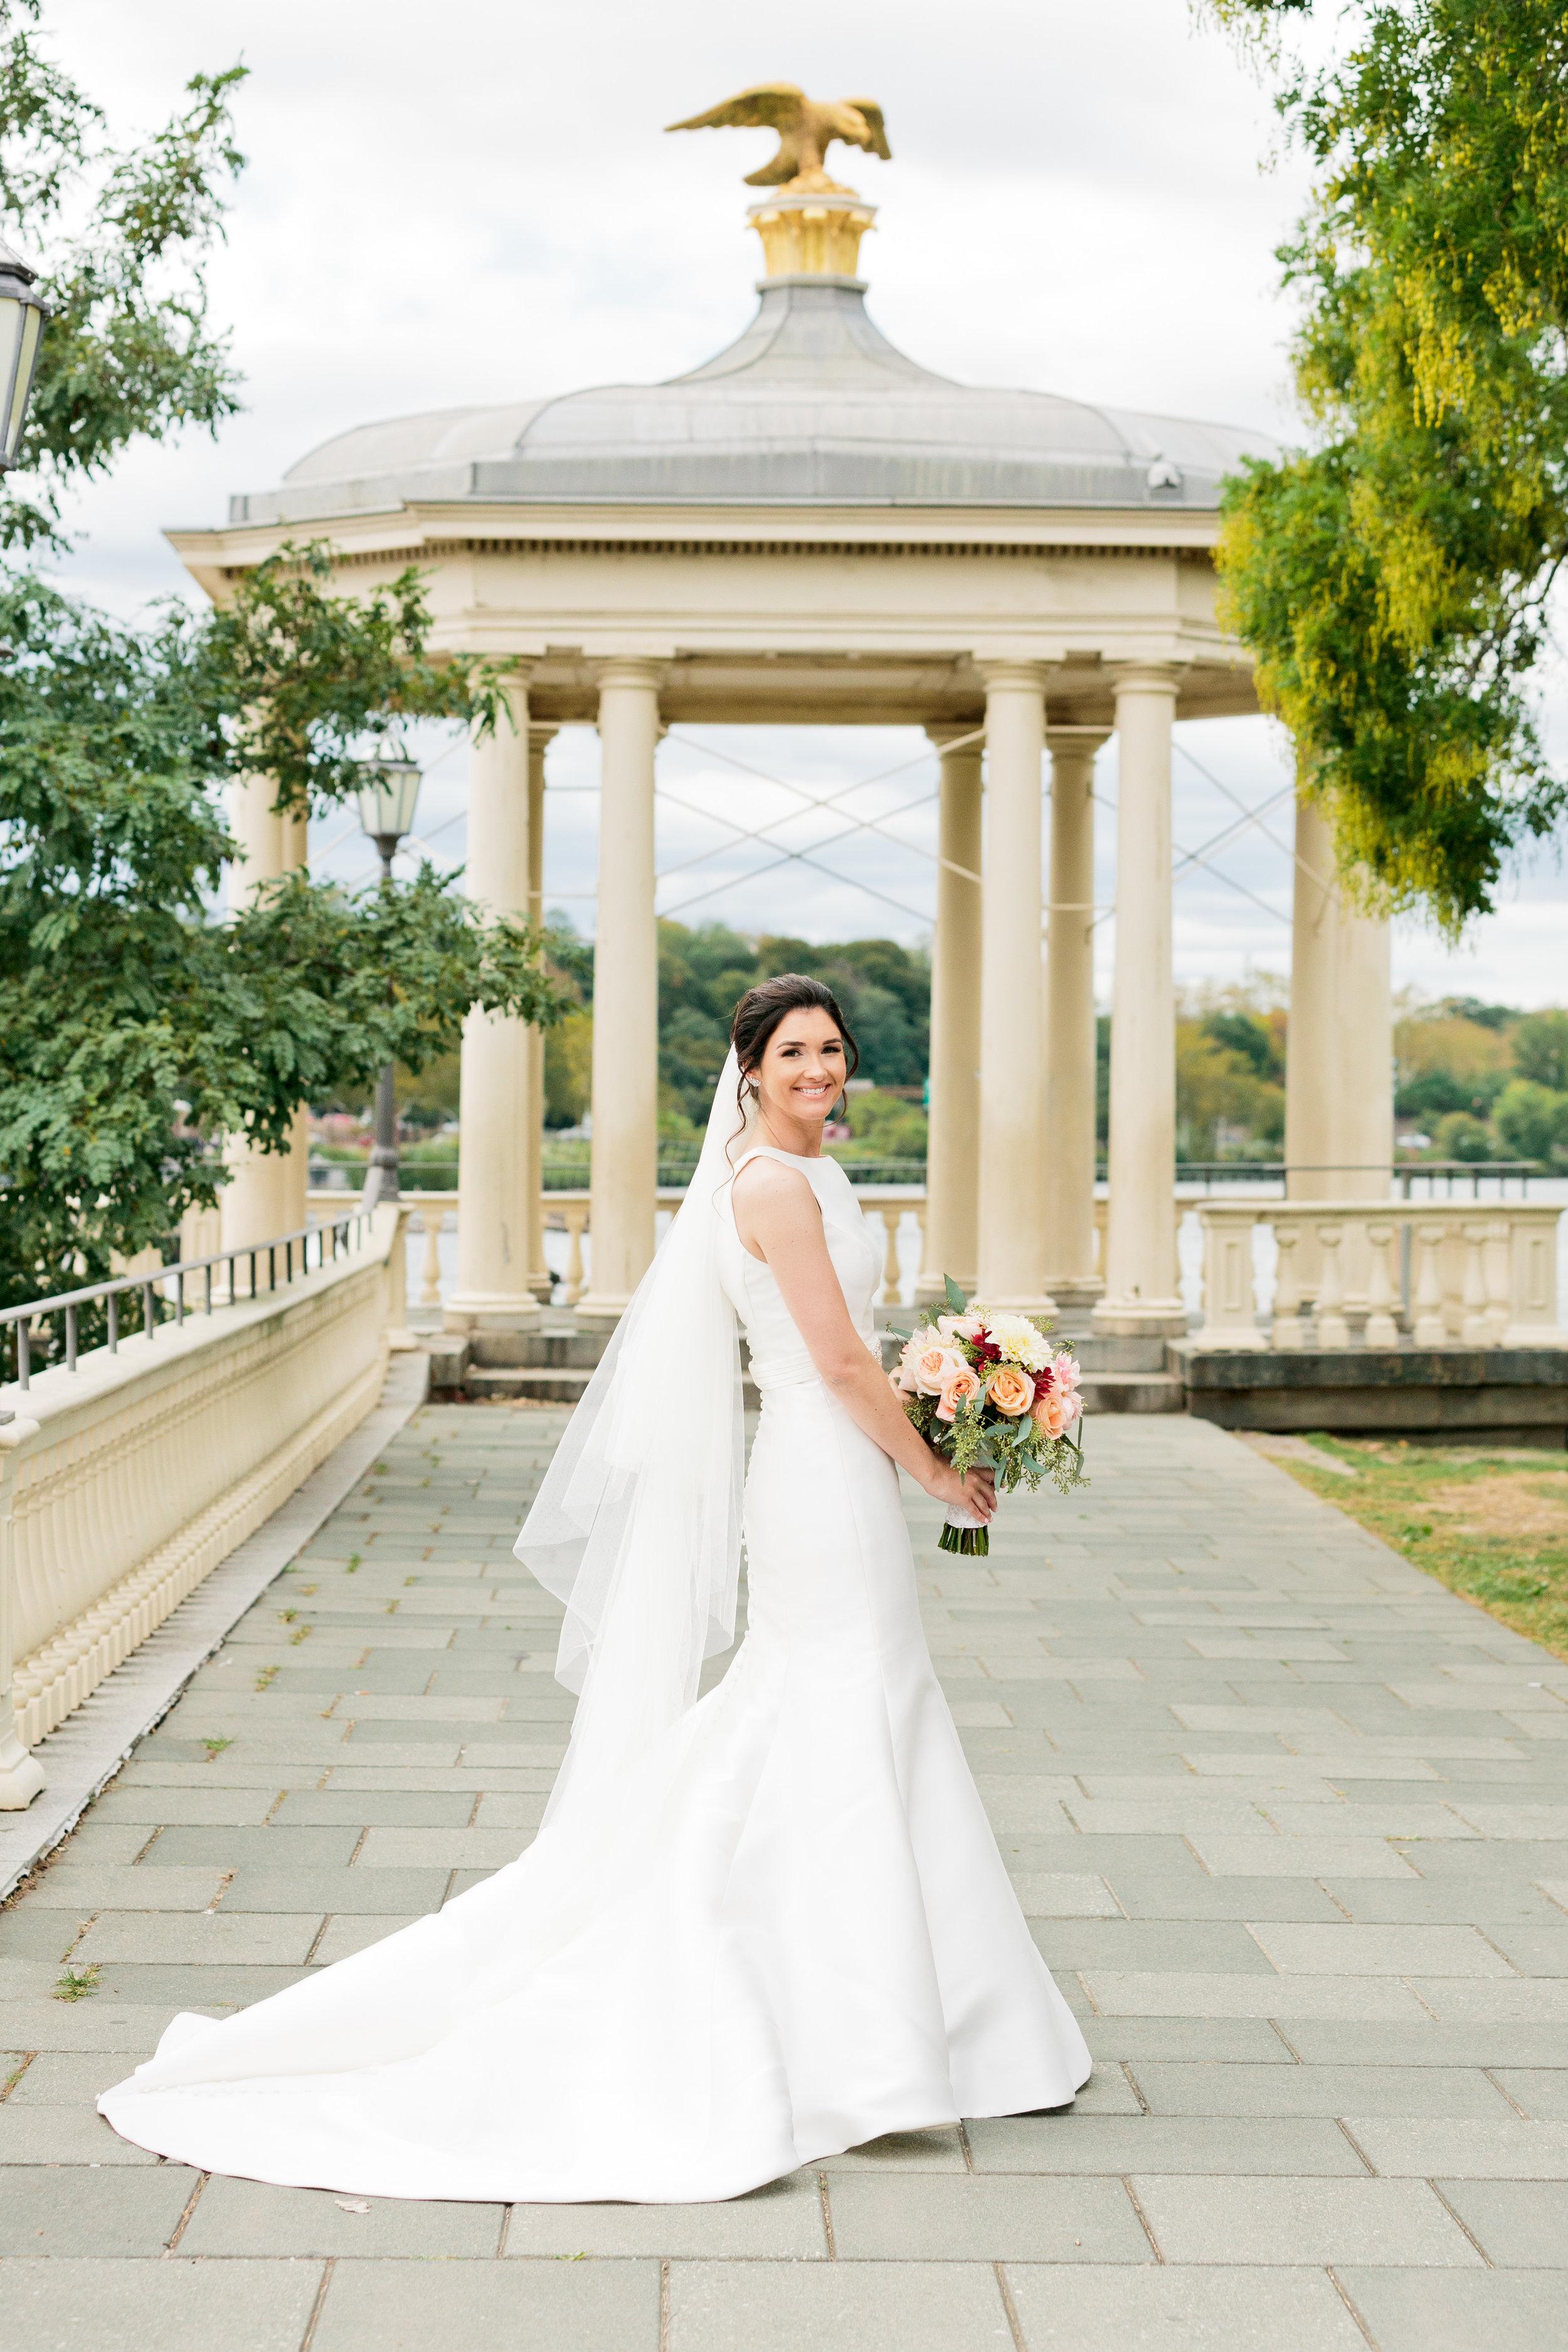 Hudson-Nichols-Black-Tie-Bride-Philadelphia-Waterworks-Wedding-Bridal-Portrait-Pronovias03.jpg